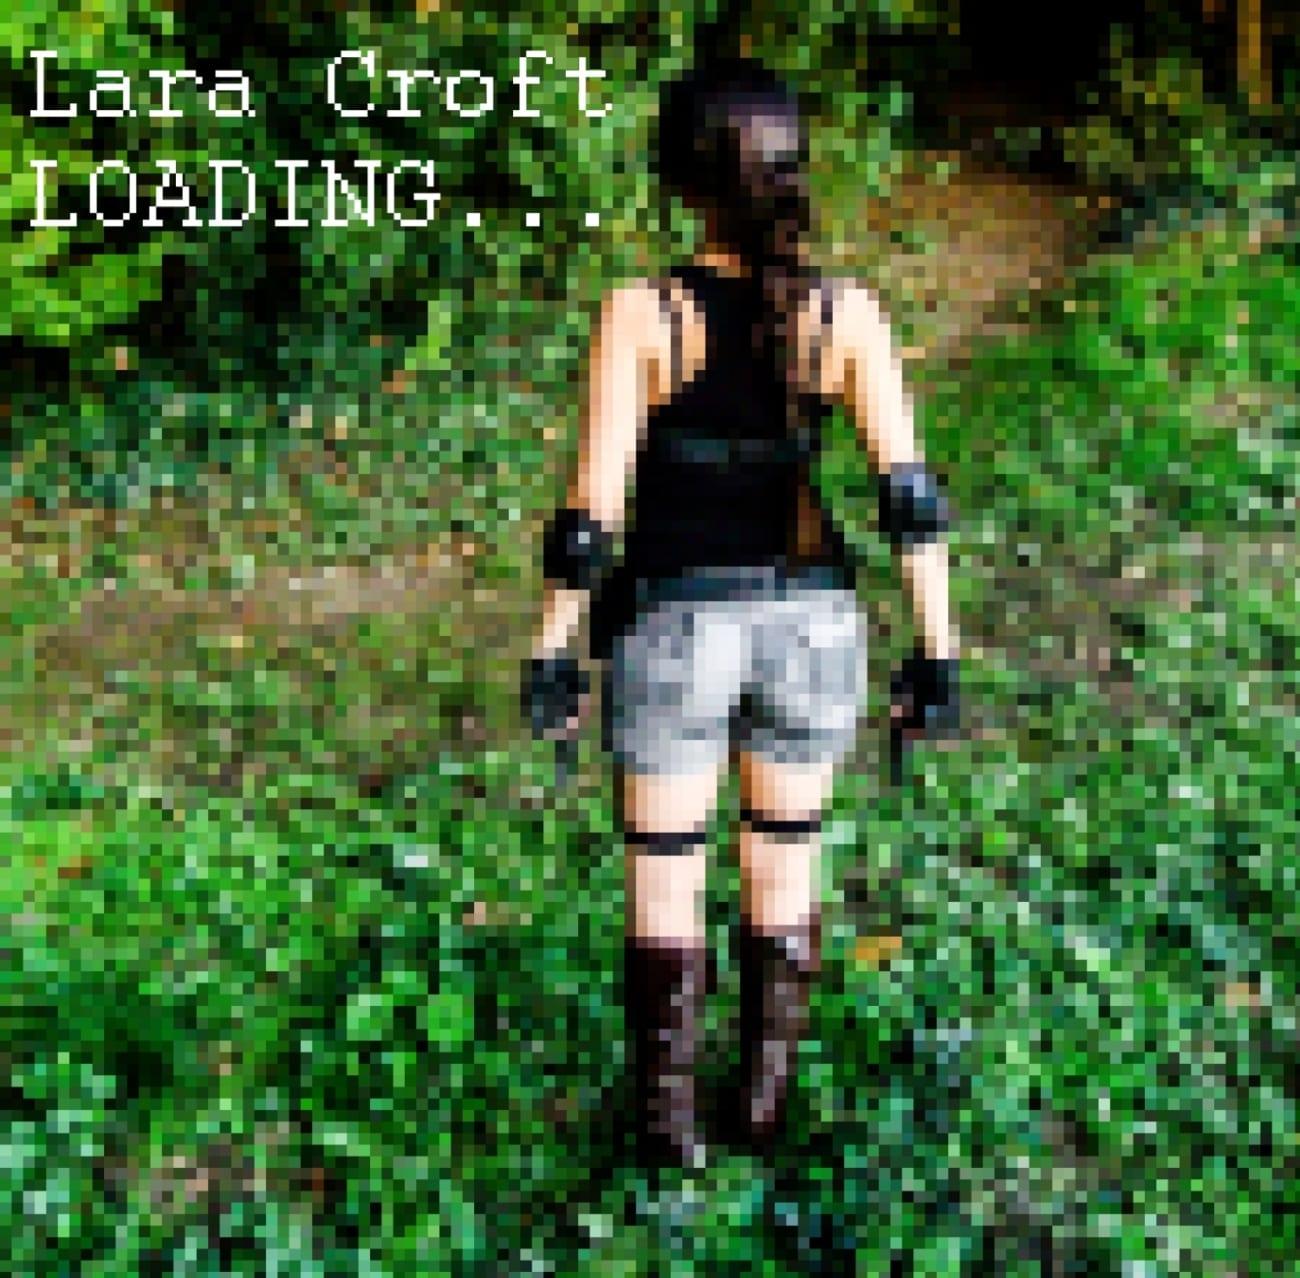 lara croft cosplay costume romania fashion blogger roxi rose halloween tomb raider (15)